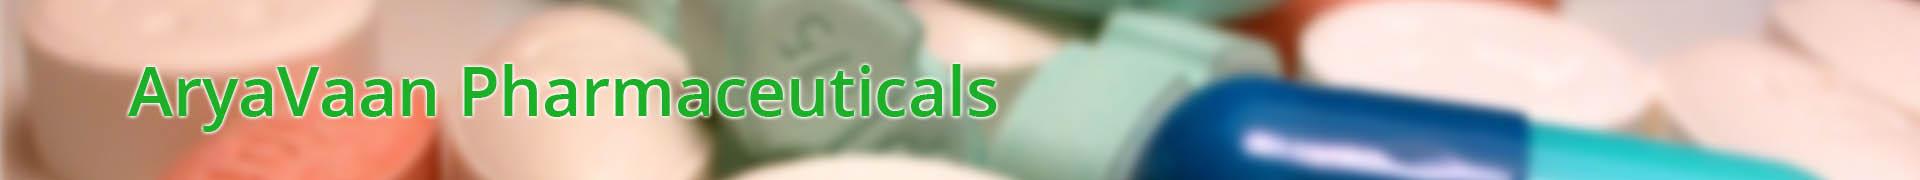 AryaVaan Pharmaceuticals